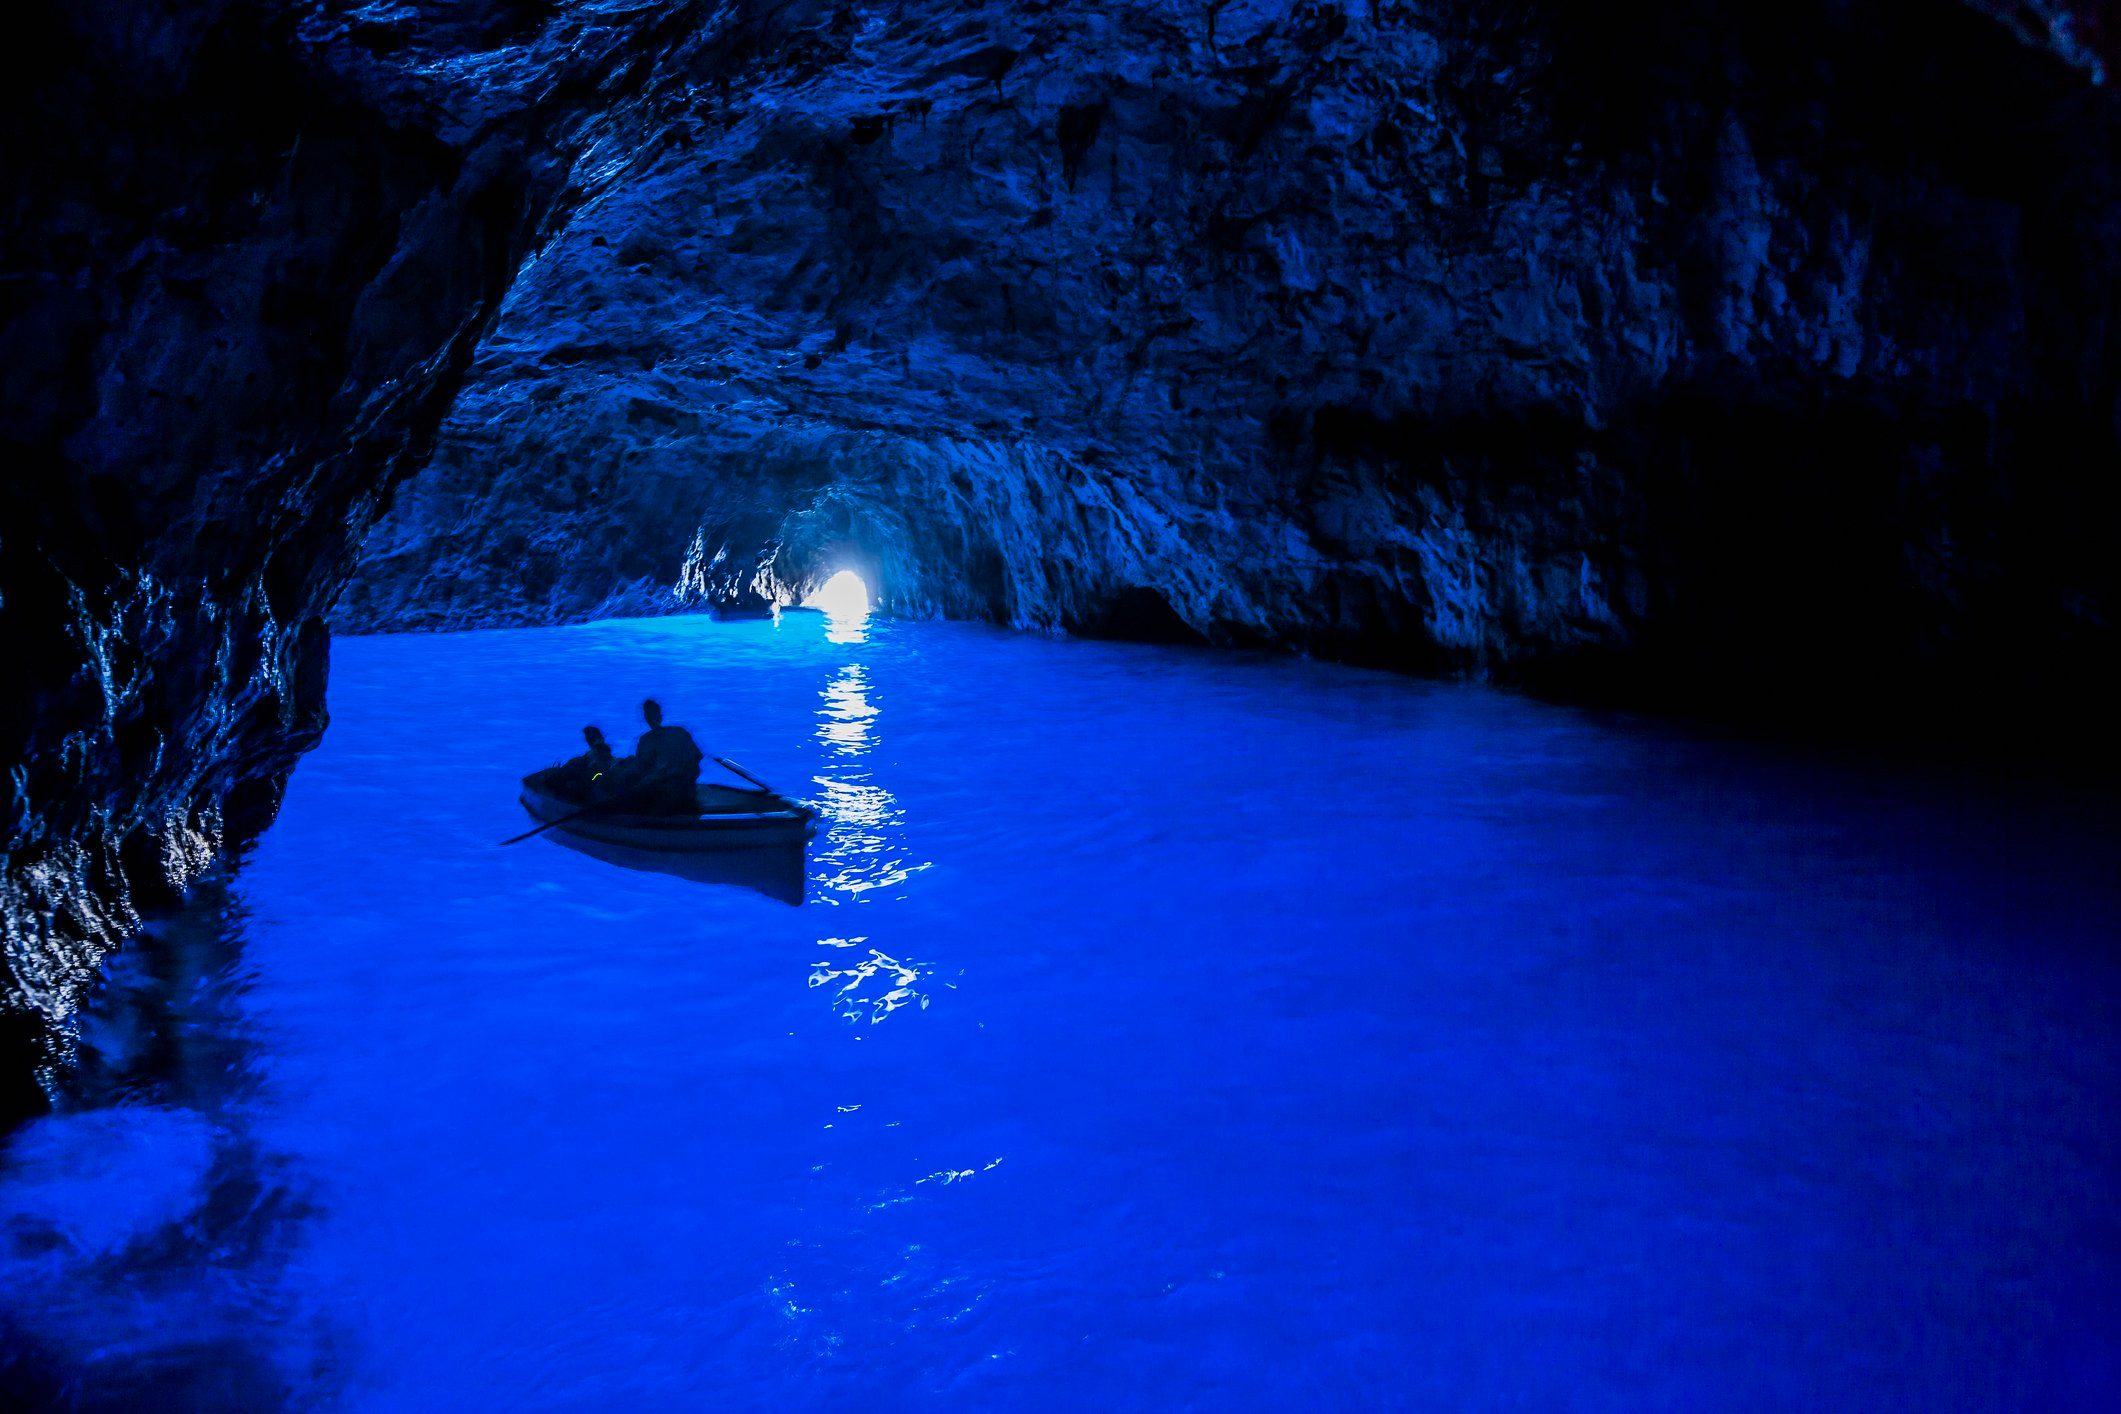 Capri Island, the Grotta Azzurra (Blue Grotto)